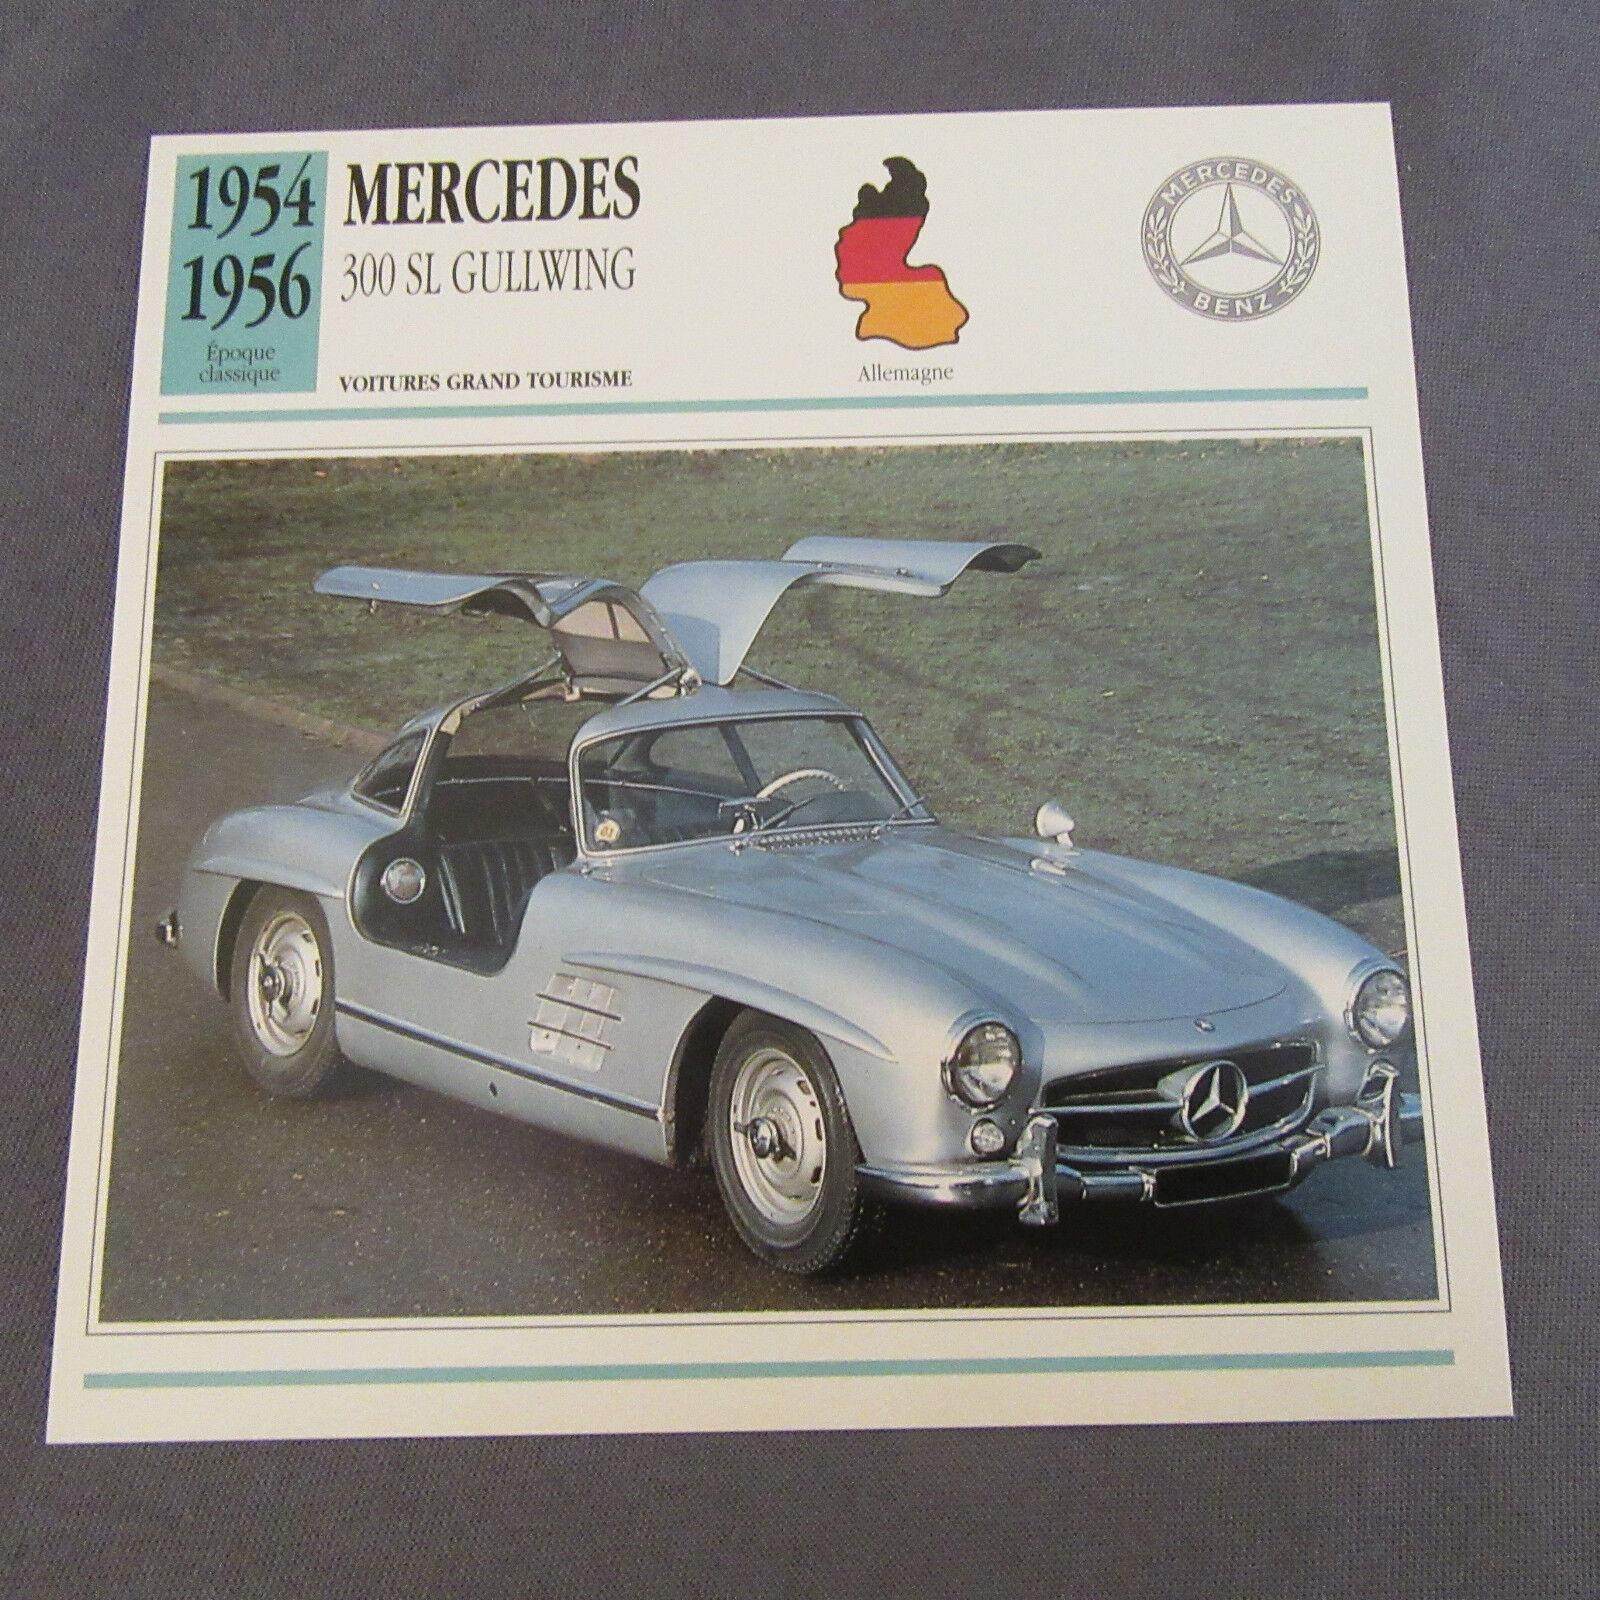 651C Edito Service Fiche Dépliant Mercedes 300 300 300 SL Gullwing ee06c9